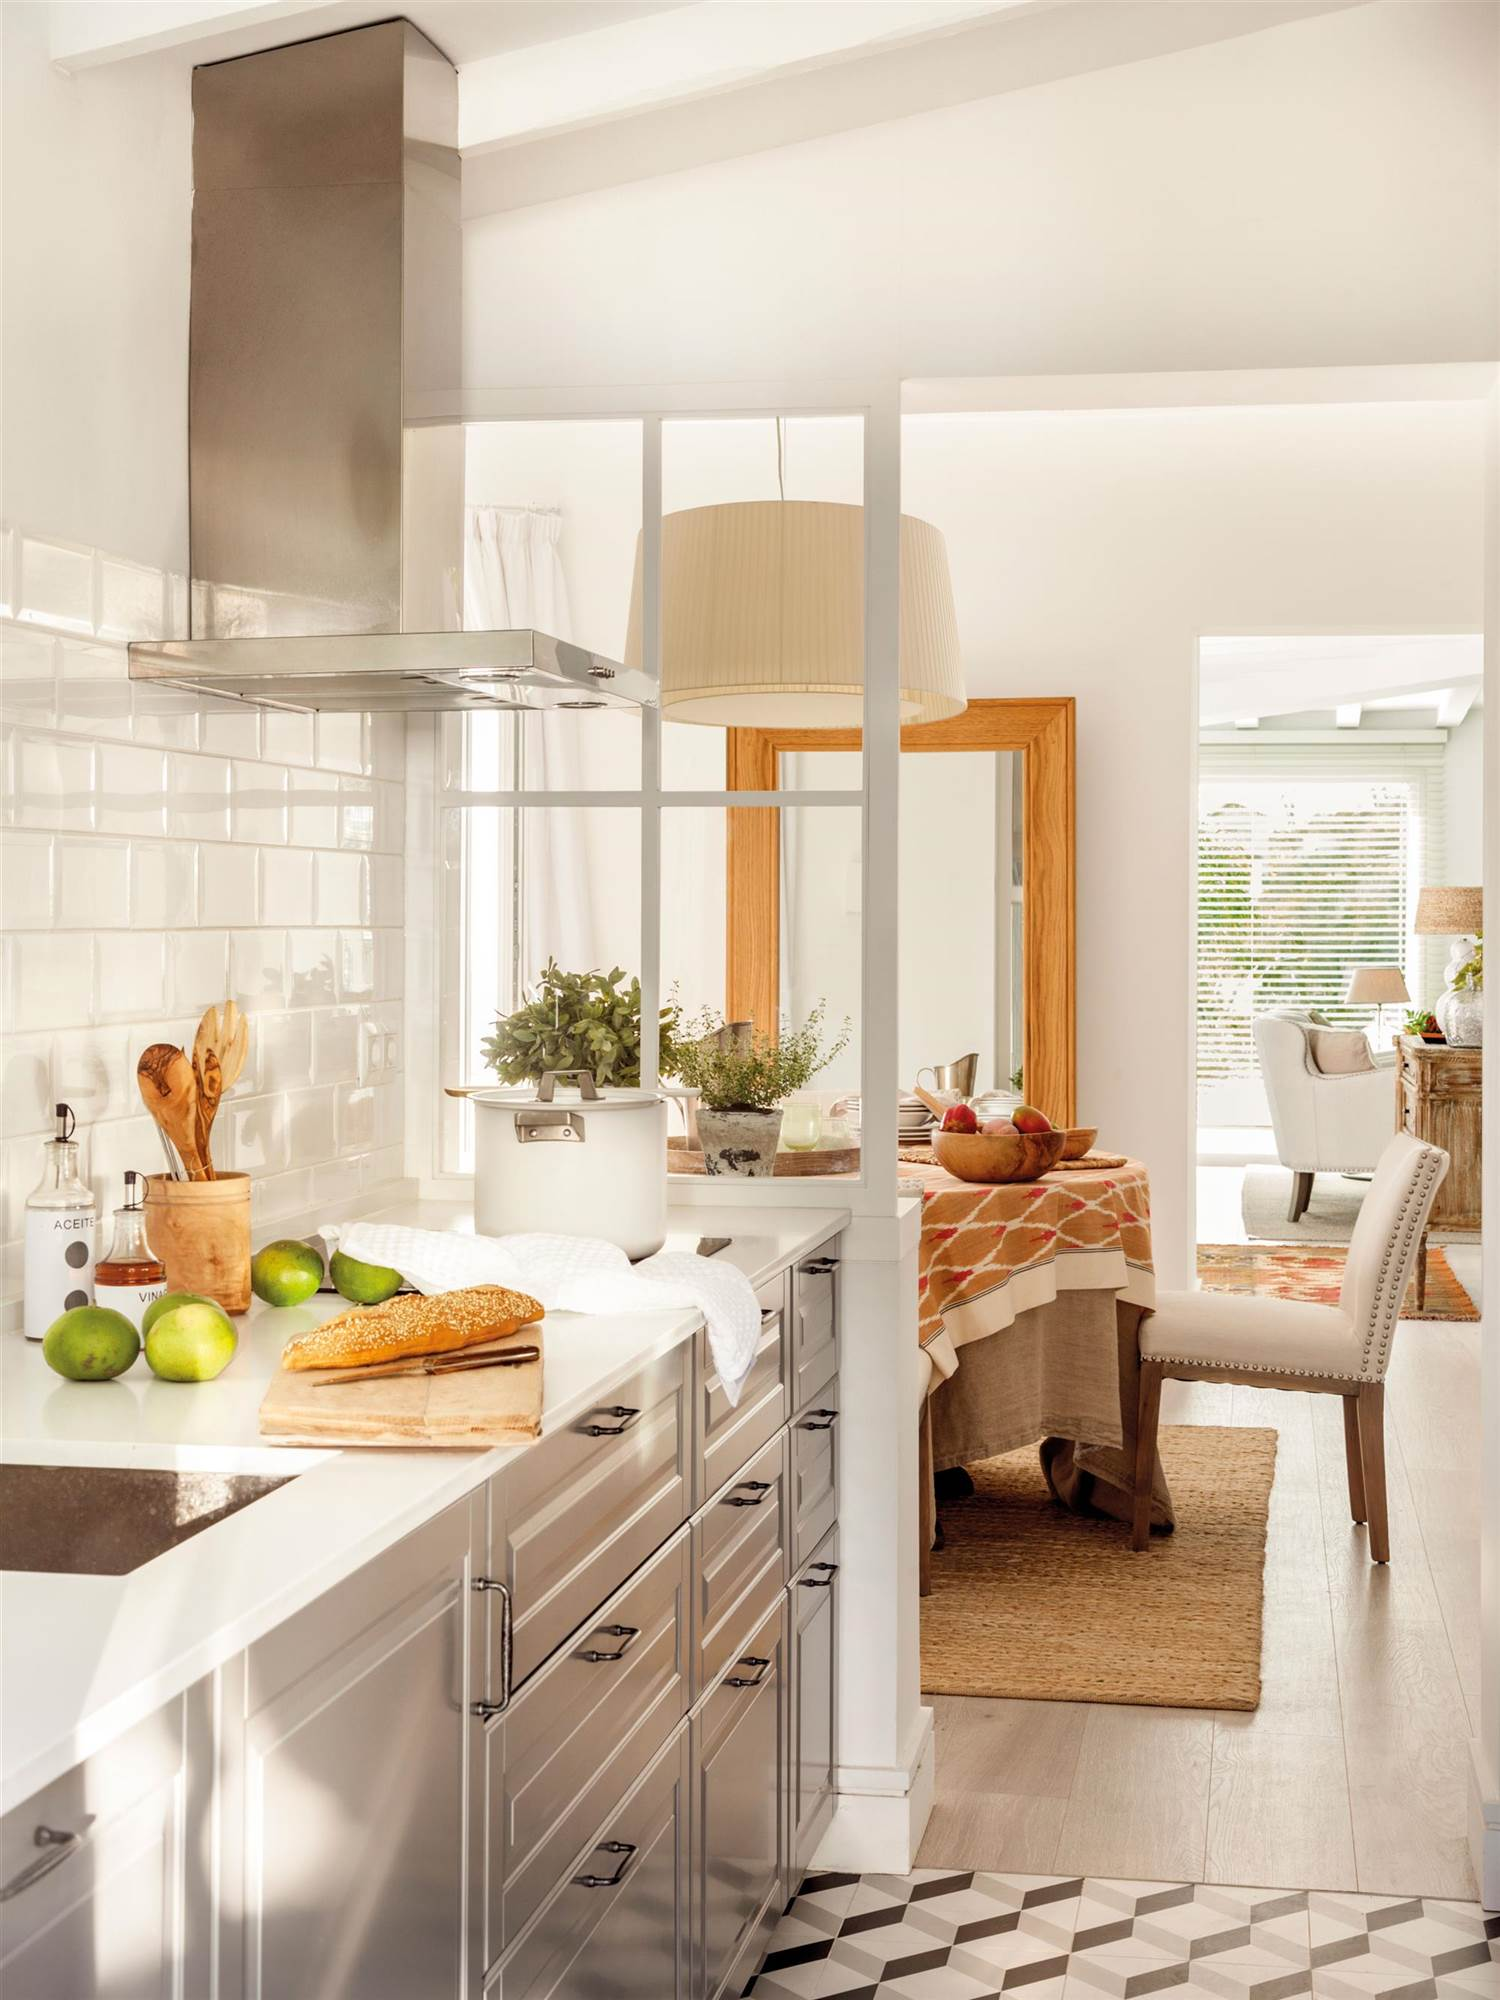 Cocina abierta o cerrada for Cocina separada por un techo de vidrio